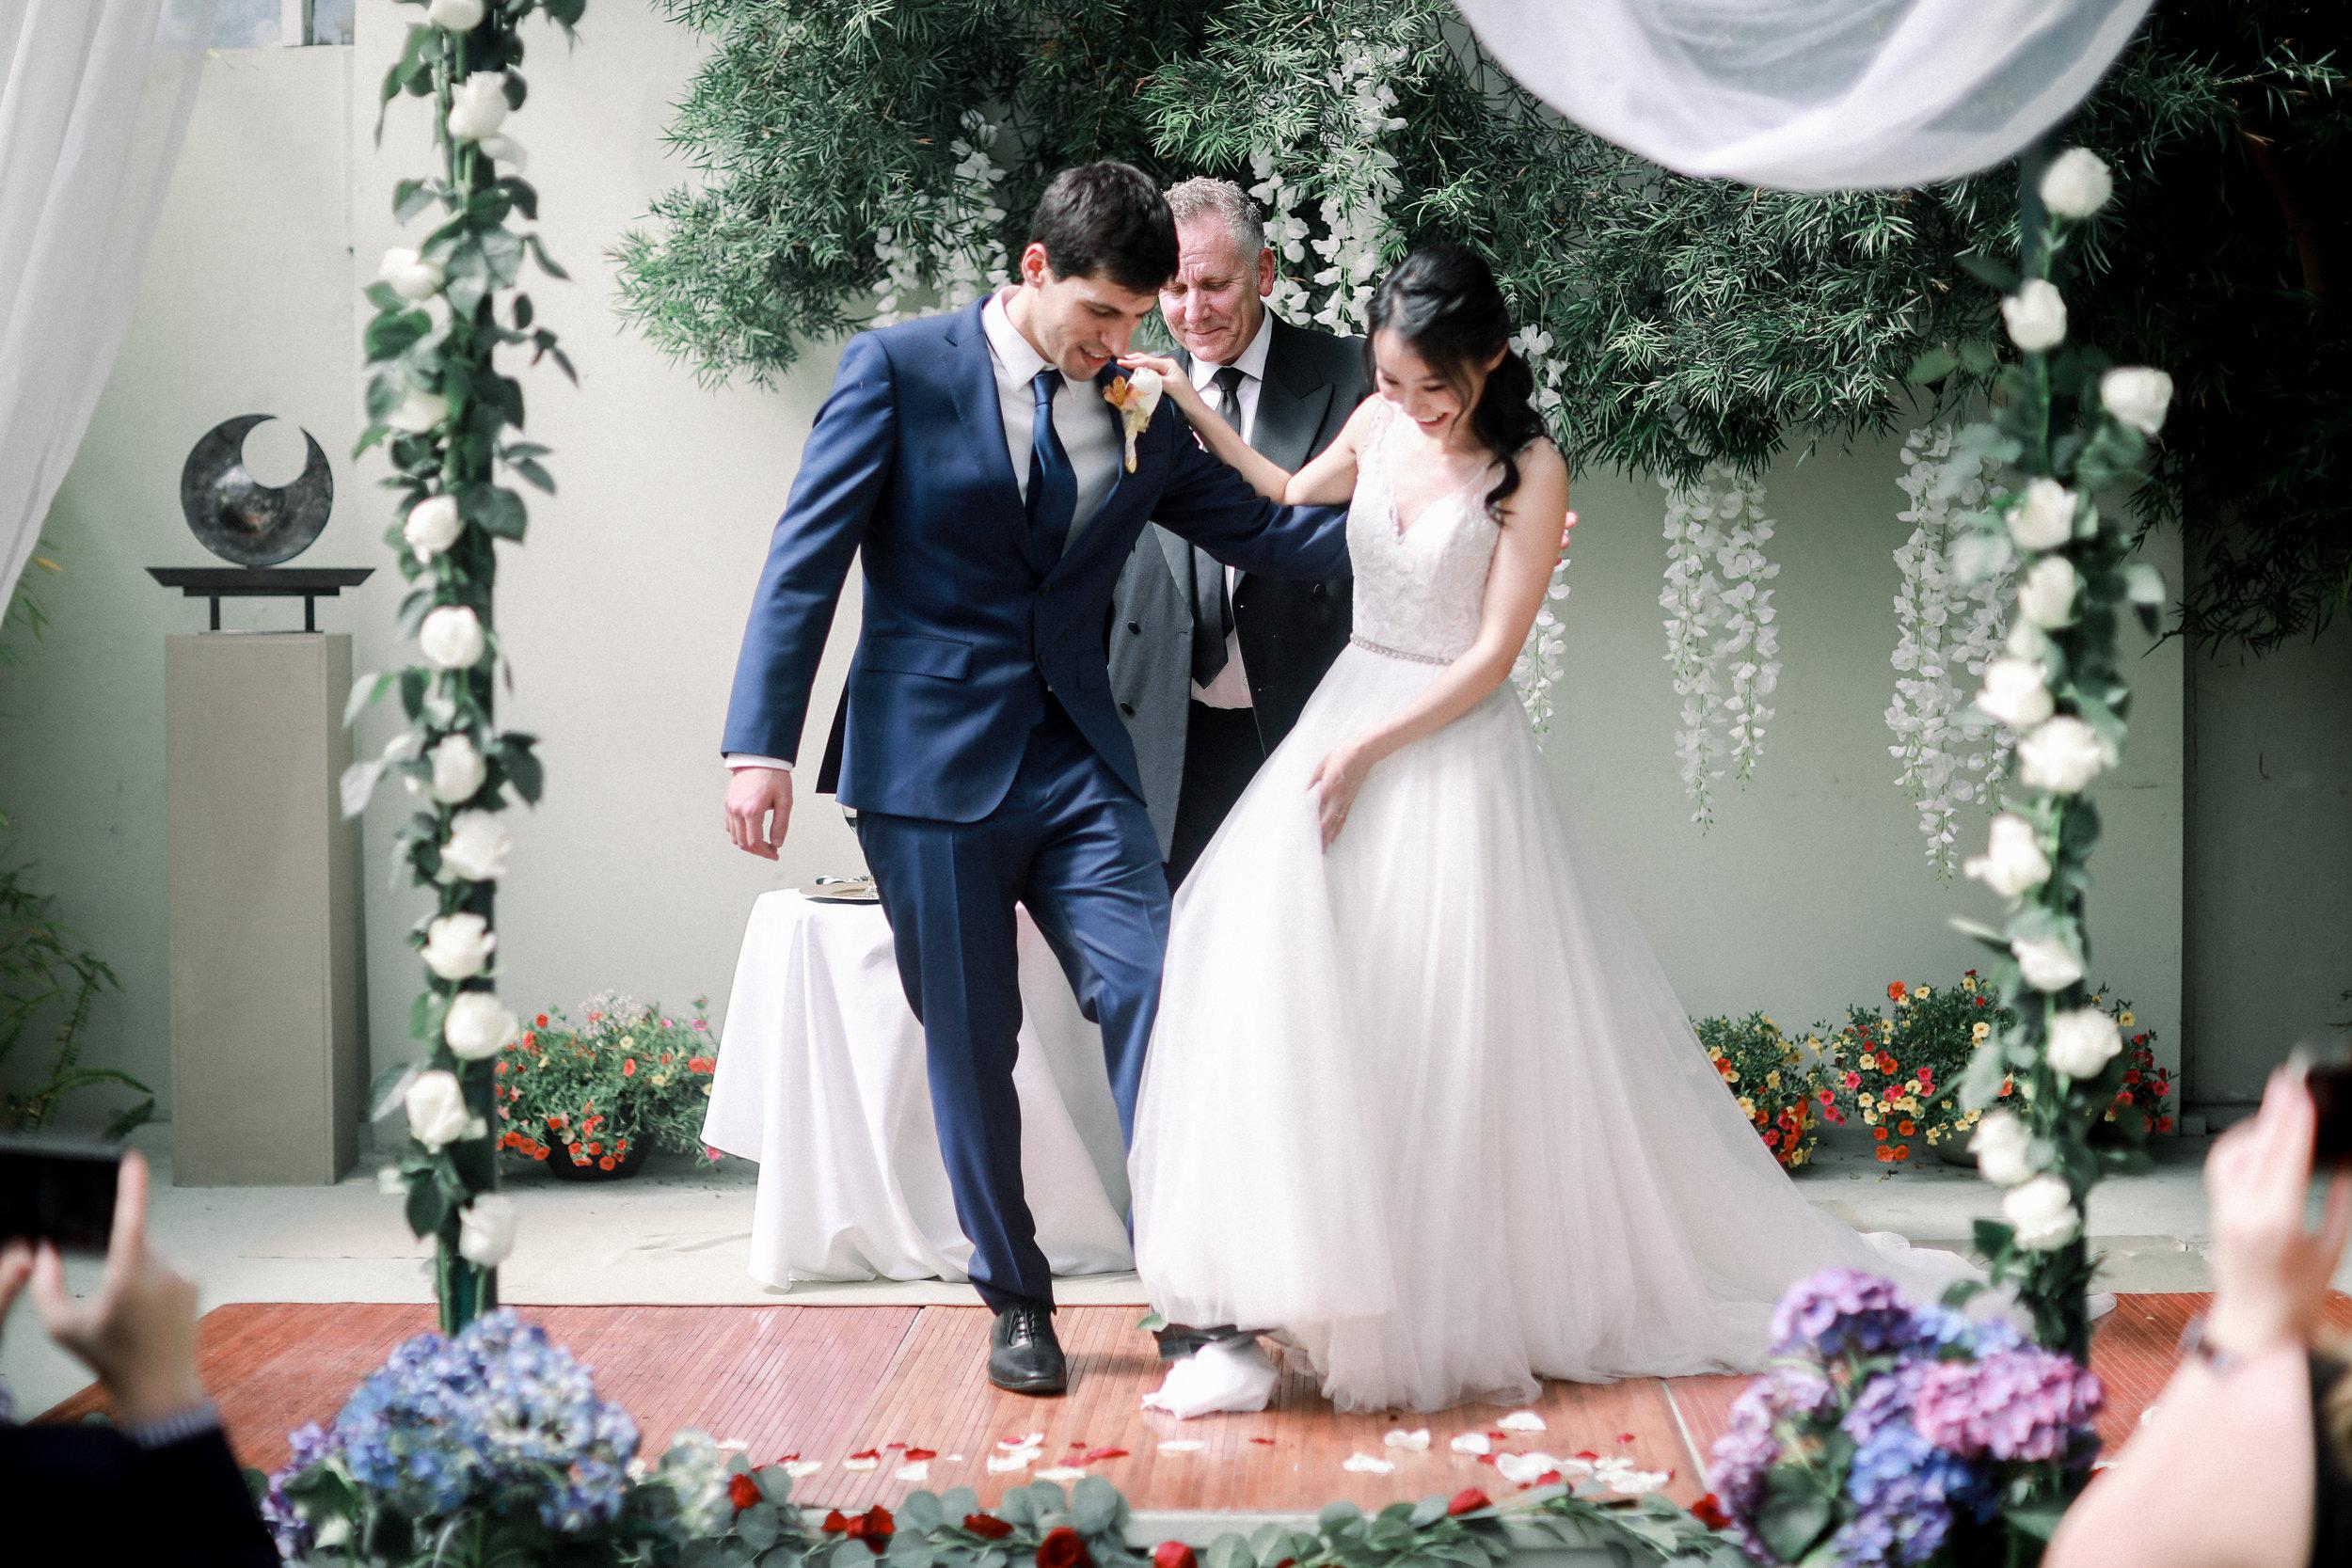 Kali + Ofir | Pacifica Wedding-381.jpg